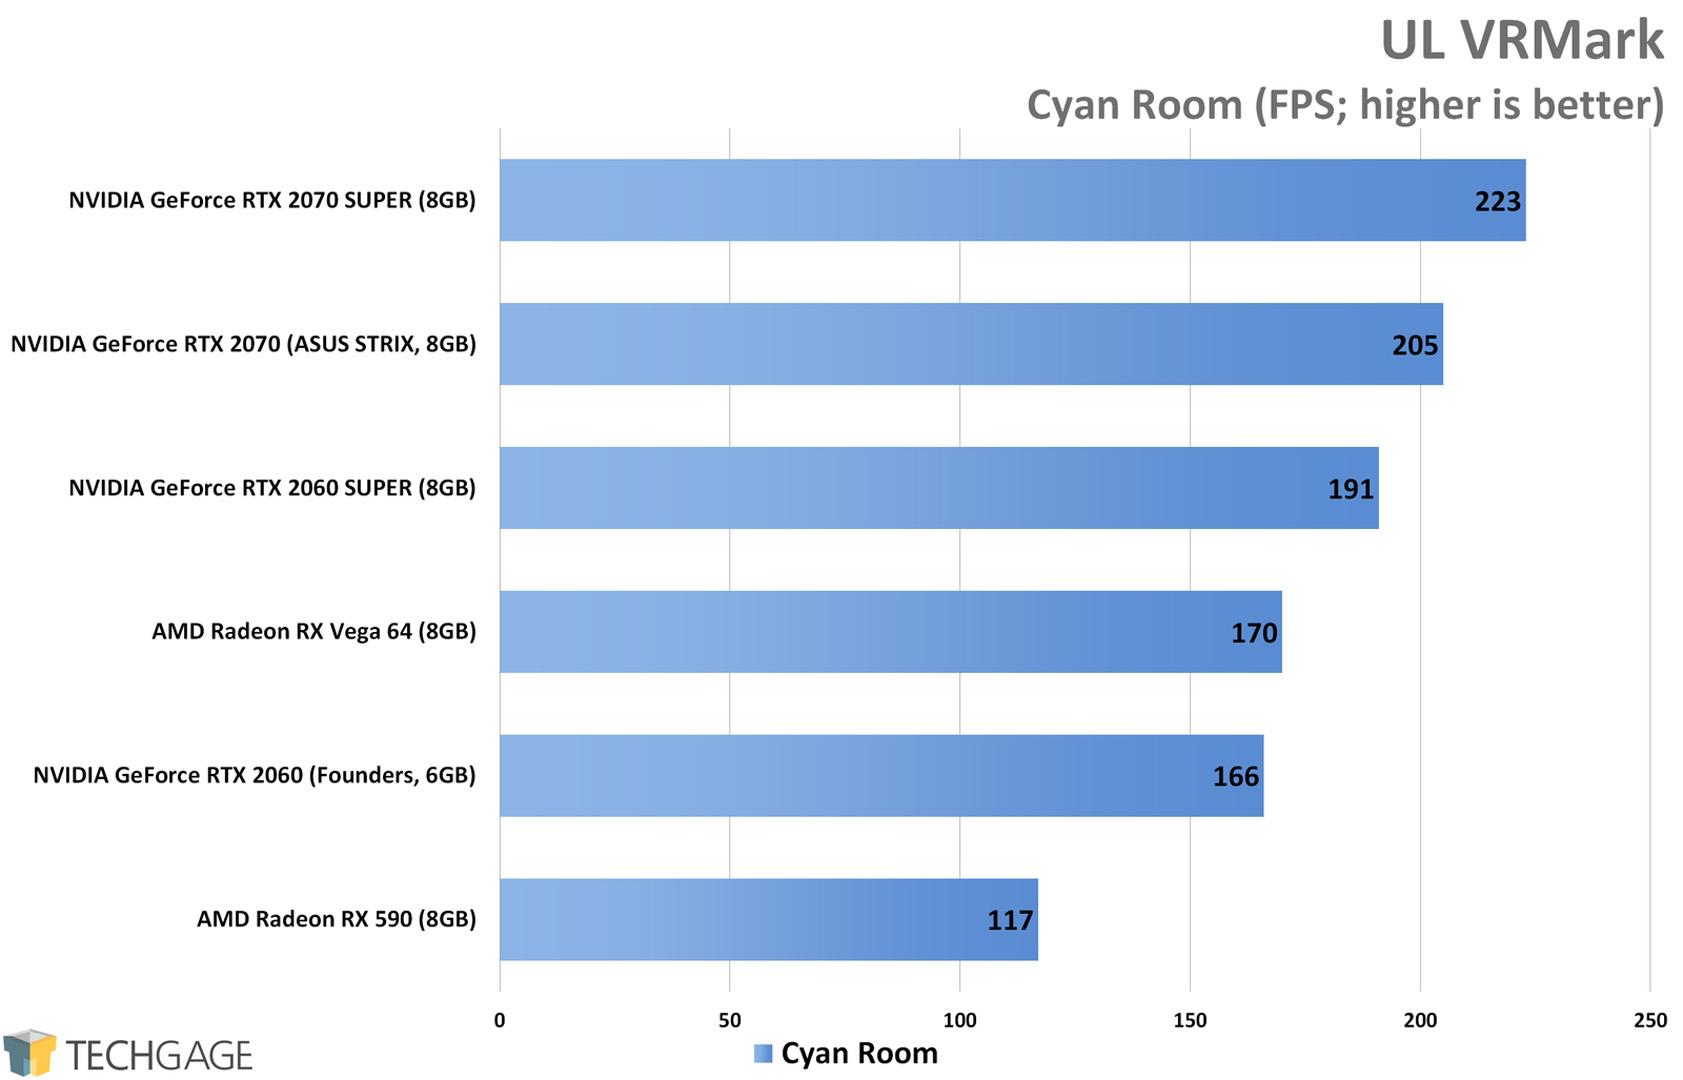 UL VRMark (Cyan Room) - NVIDIA RTX SUPER 2060 and 2070 Performance